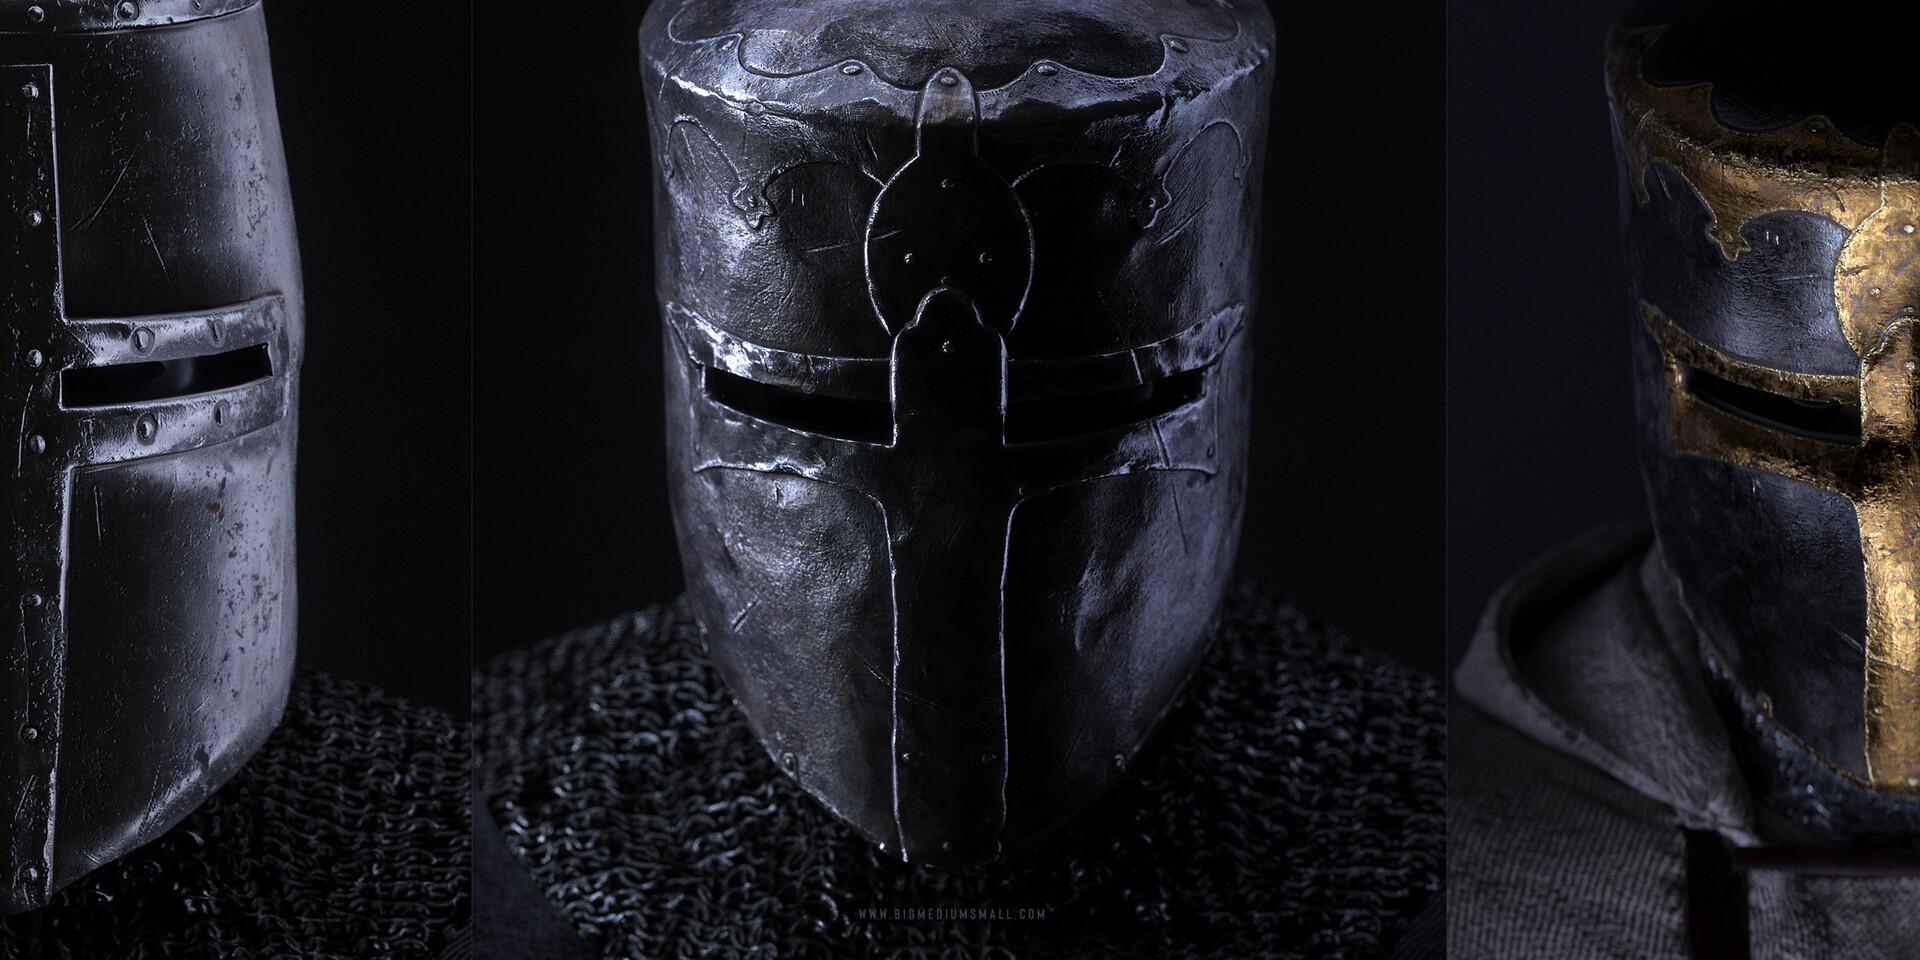 Oleg zherebin helmets 3